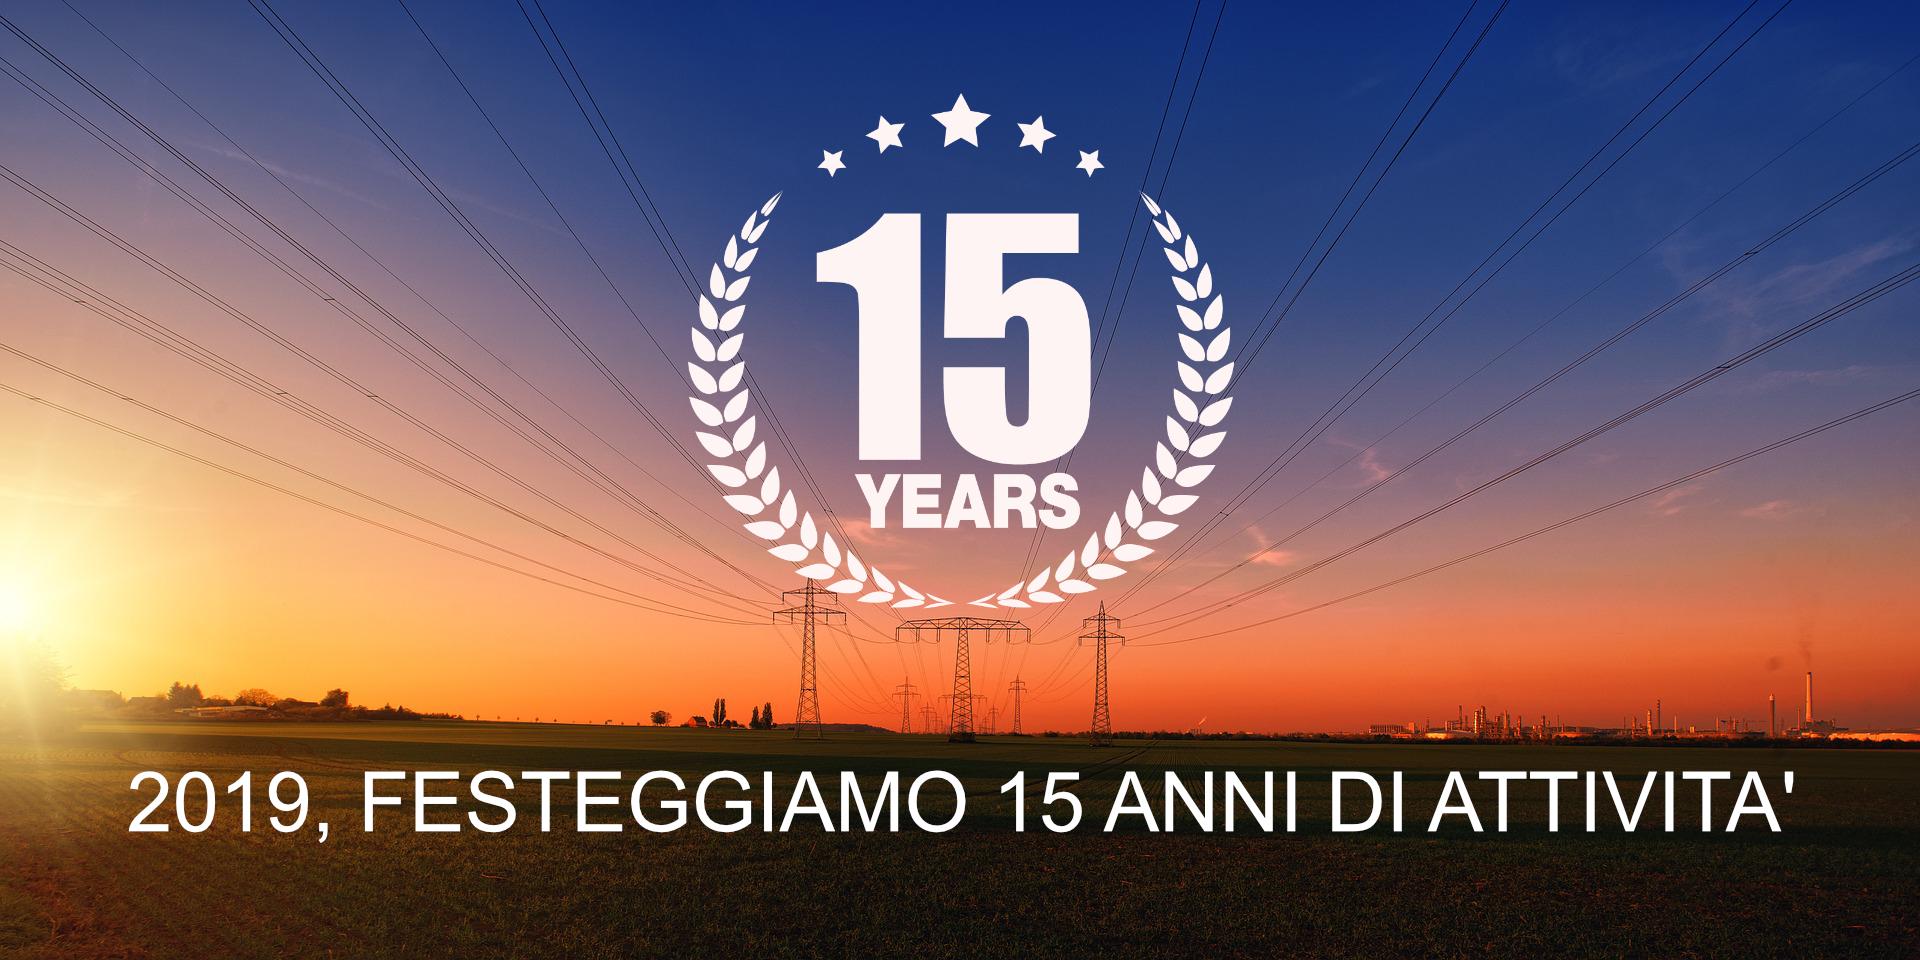 DRG SYSTEM 15 ANNI